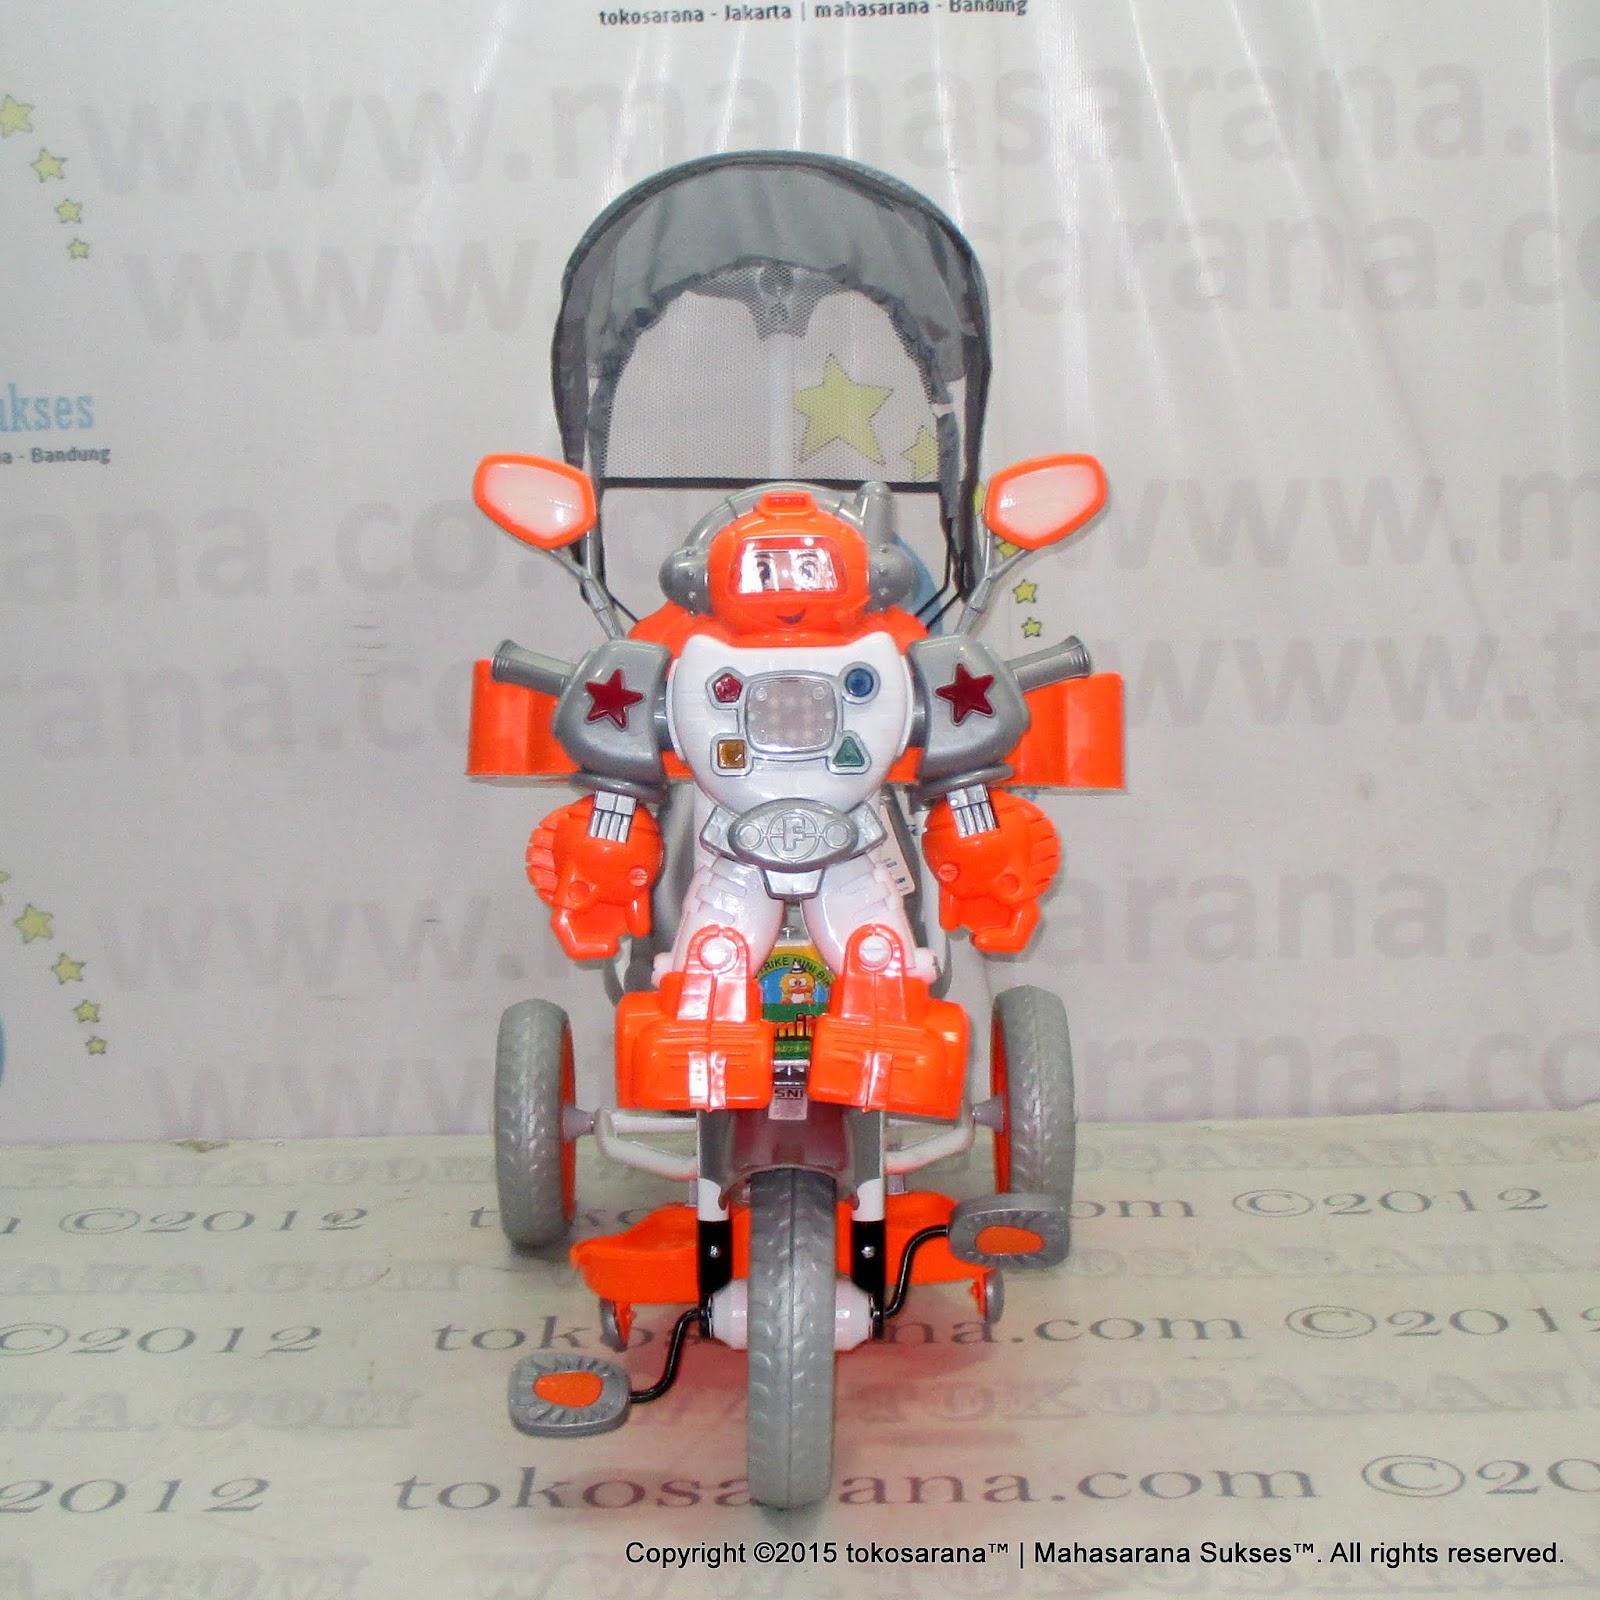 Sepeda Roda Tiga Family F845FT Robot Suspensi Bintang